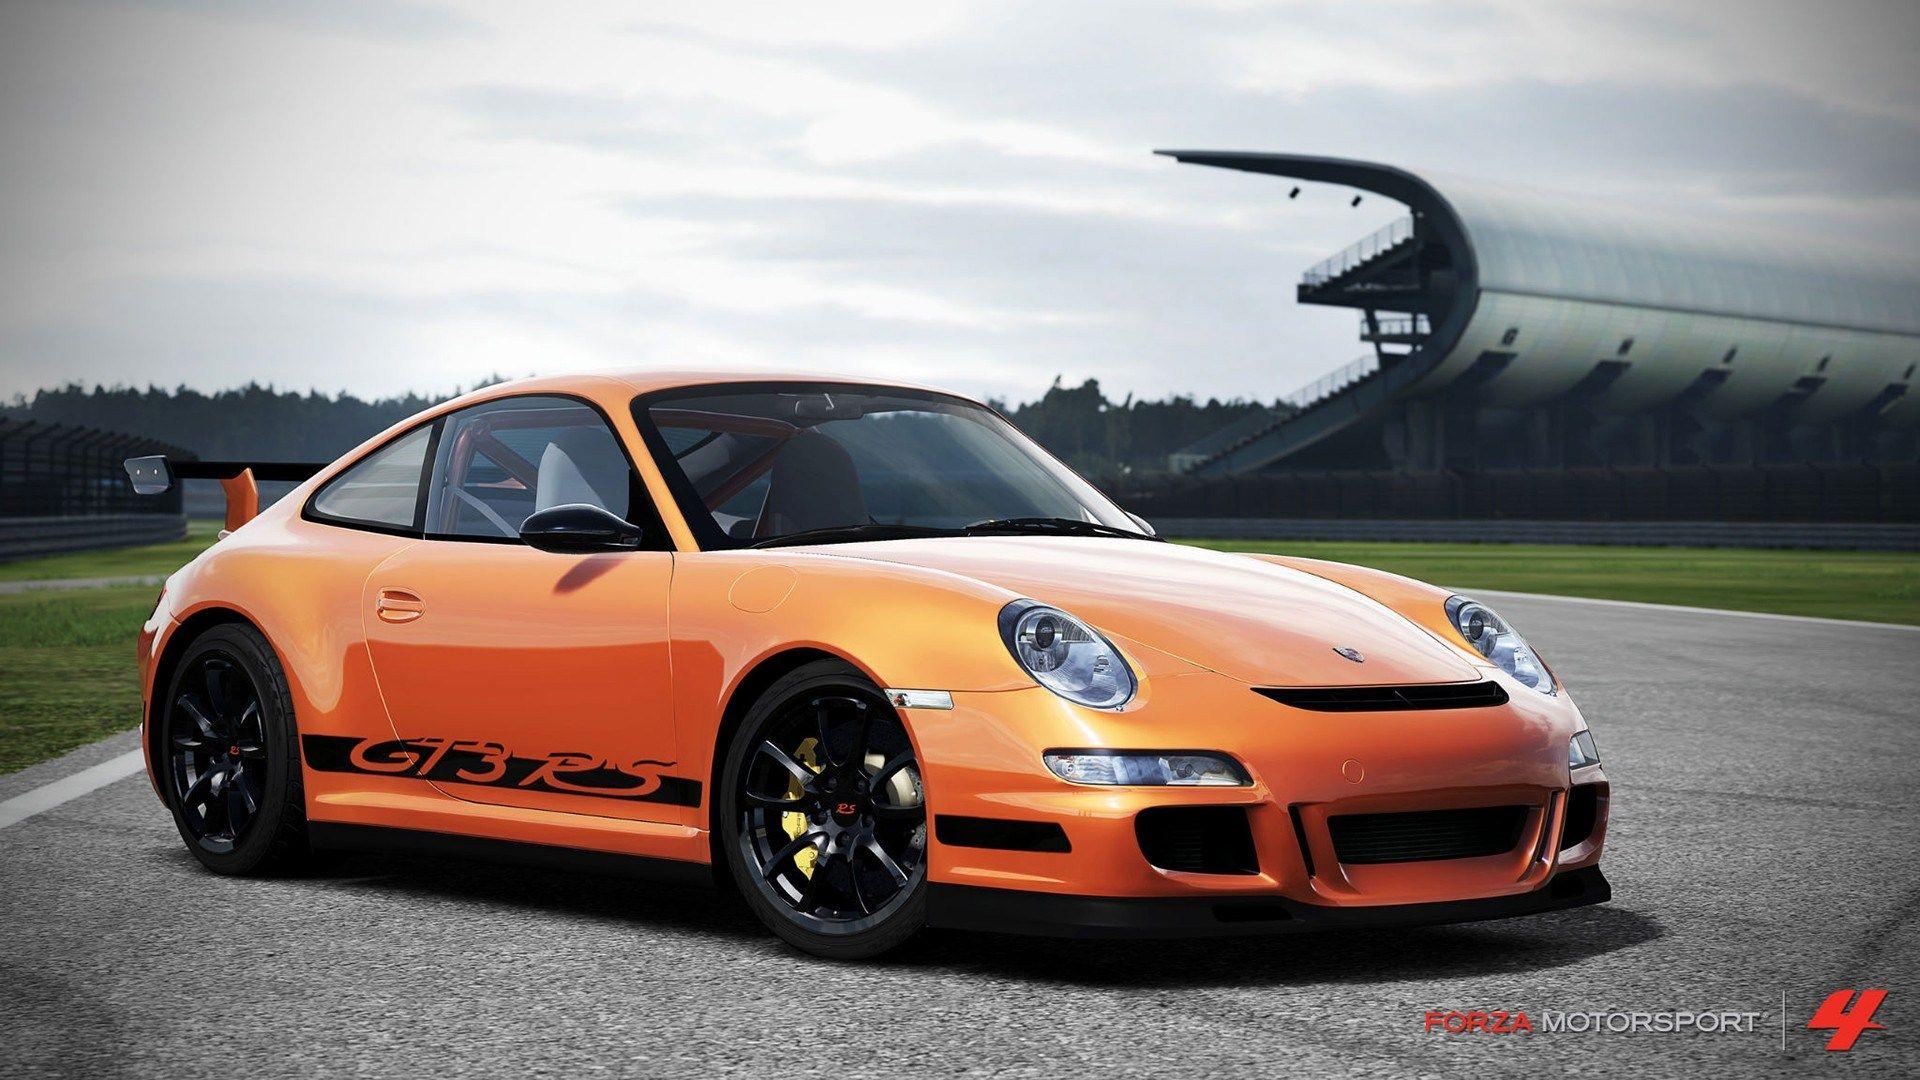 1920x1080 Wallpaper Images Forza Motorsport 4 Forza Motorsport Porsche 2007 Porsche 911